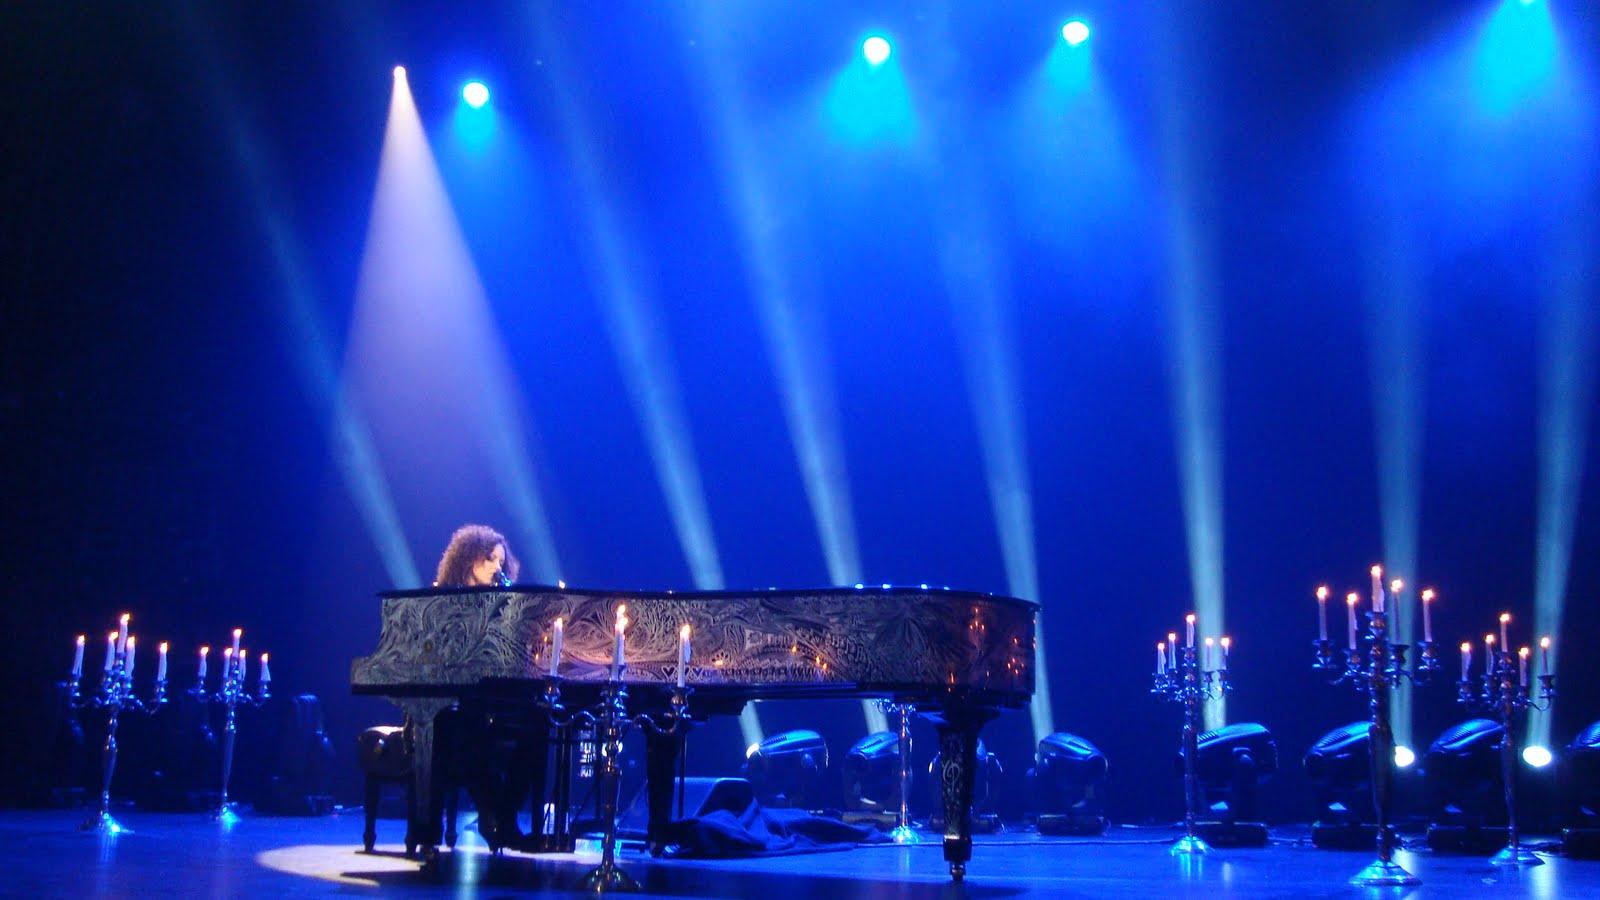 related alicia keys singing alicia keys playing piano live alicia keys ... Alicia Keys